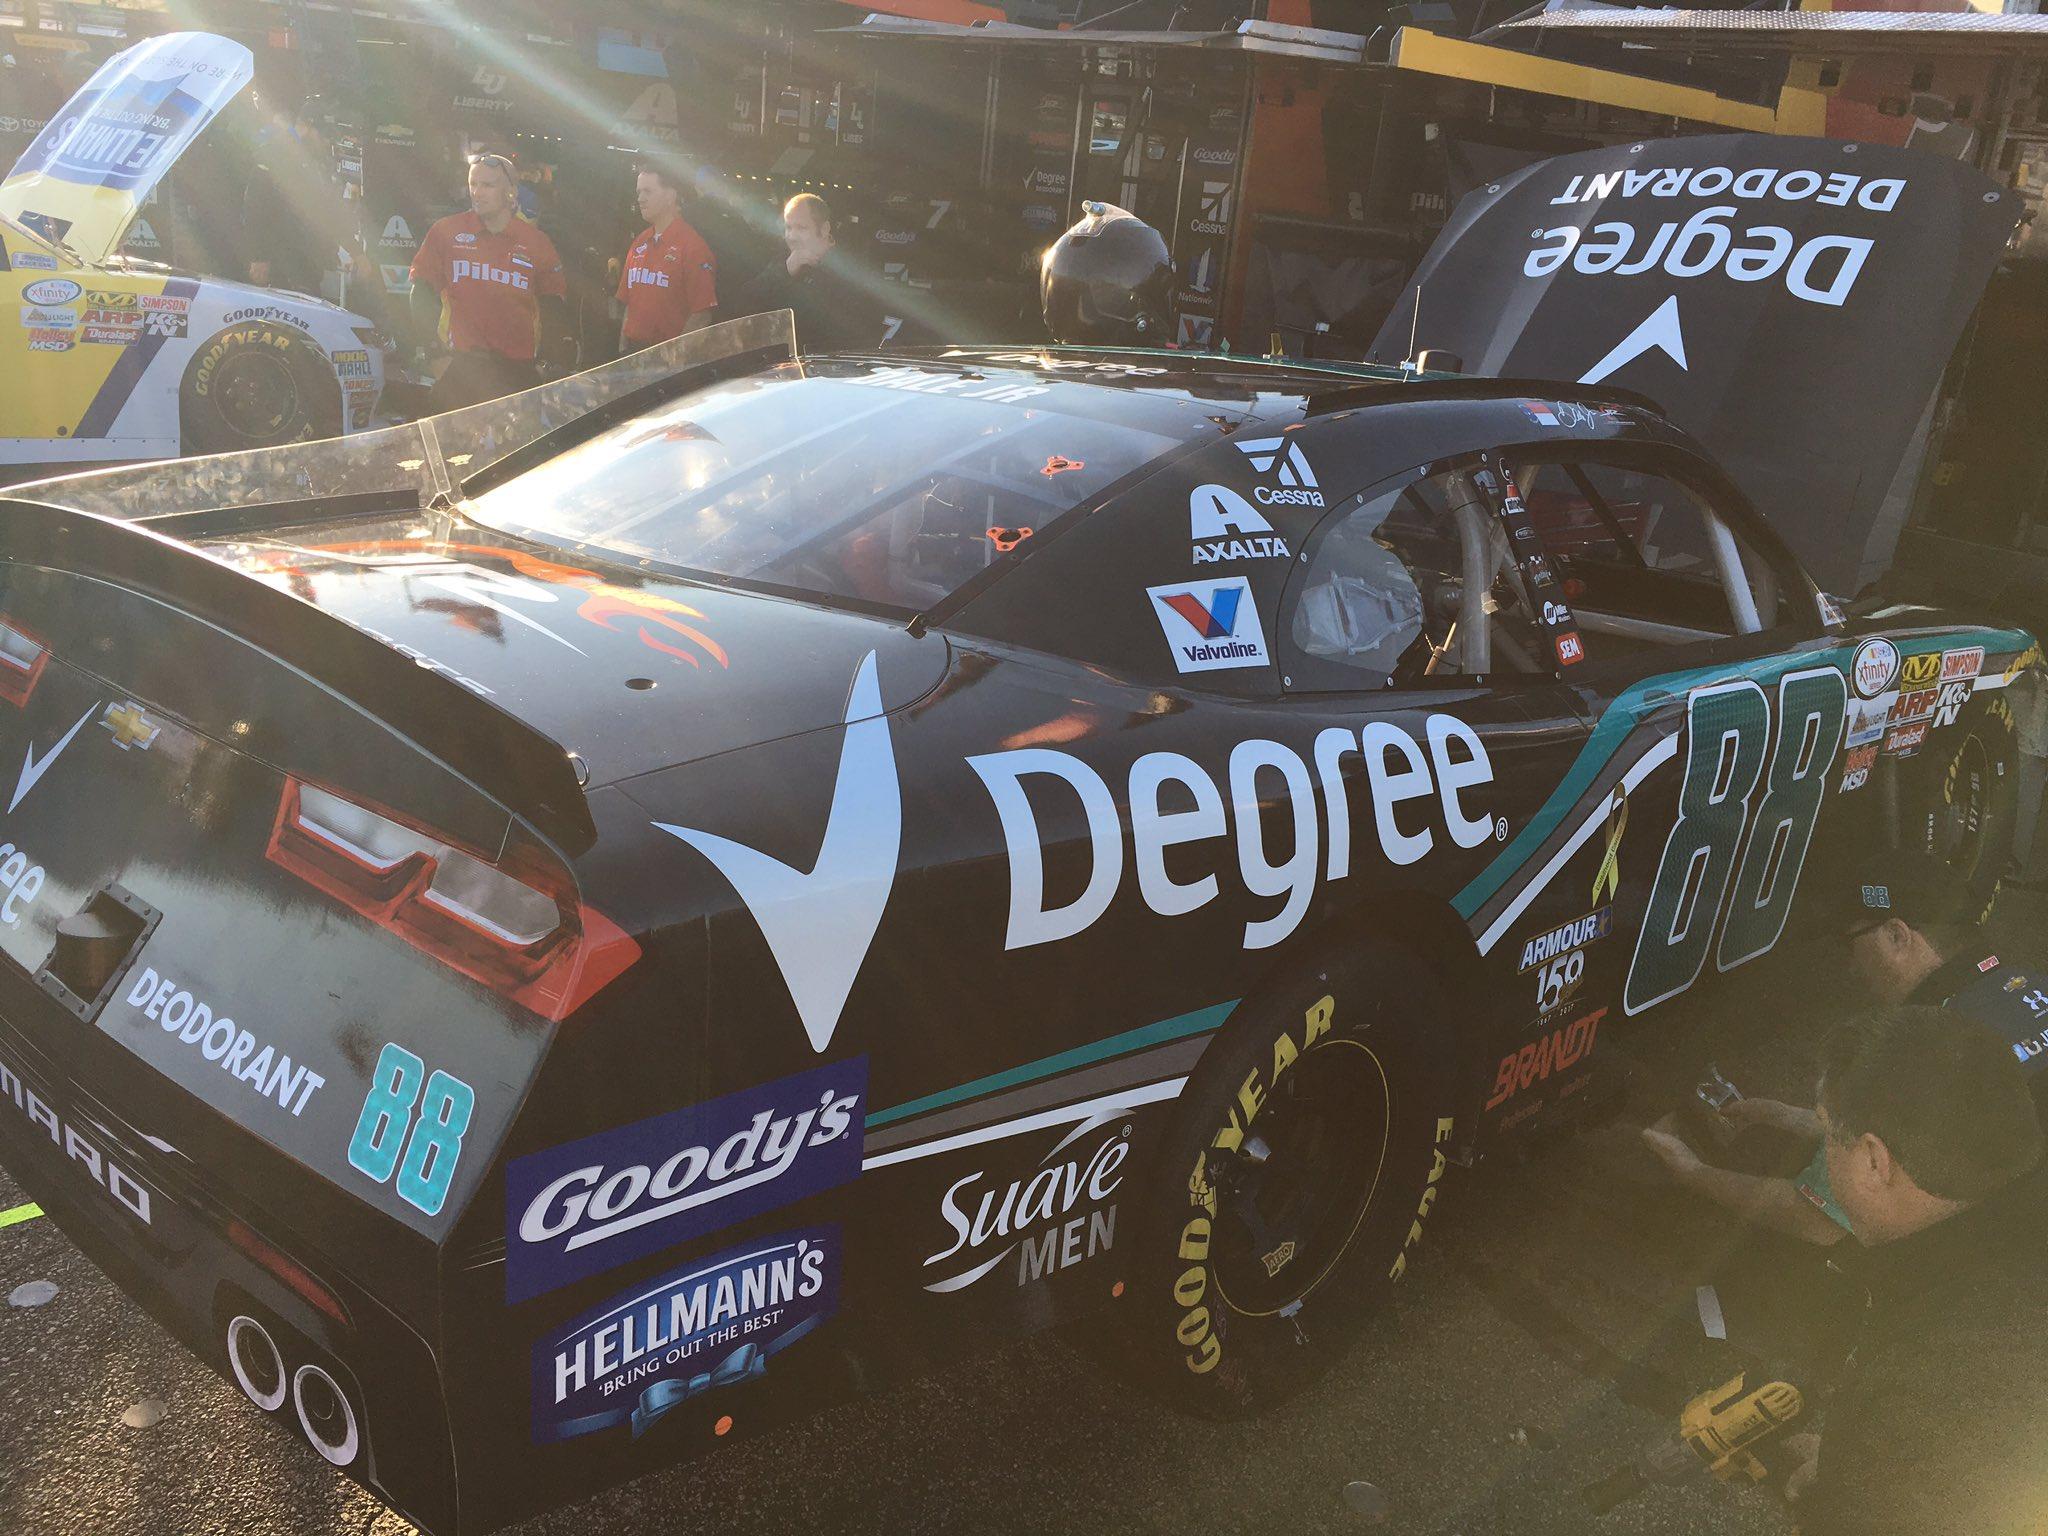 Early morning prep work on @DaleJr's @DegreeMen ride for tonight's @NASCAR_XFINITY race. https://t.co/4ZuhmVrAW5